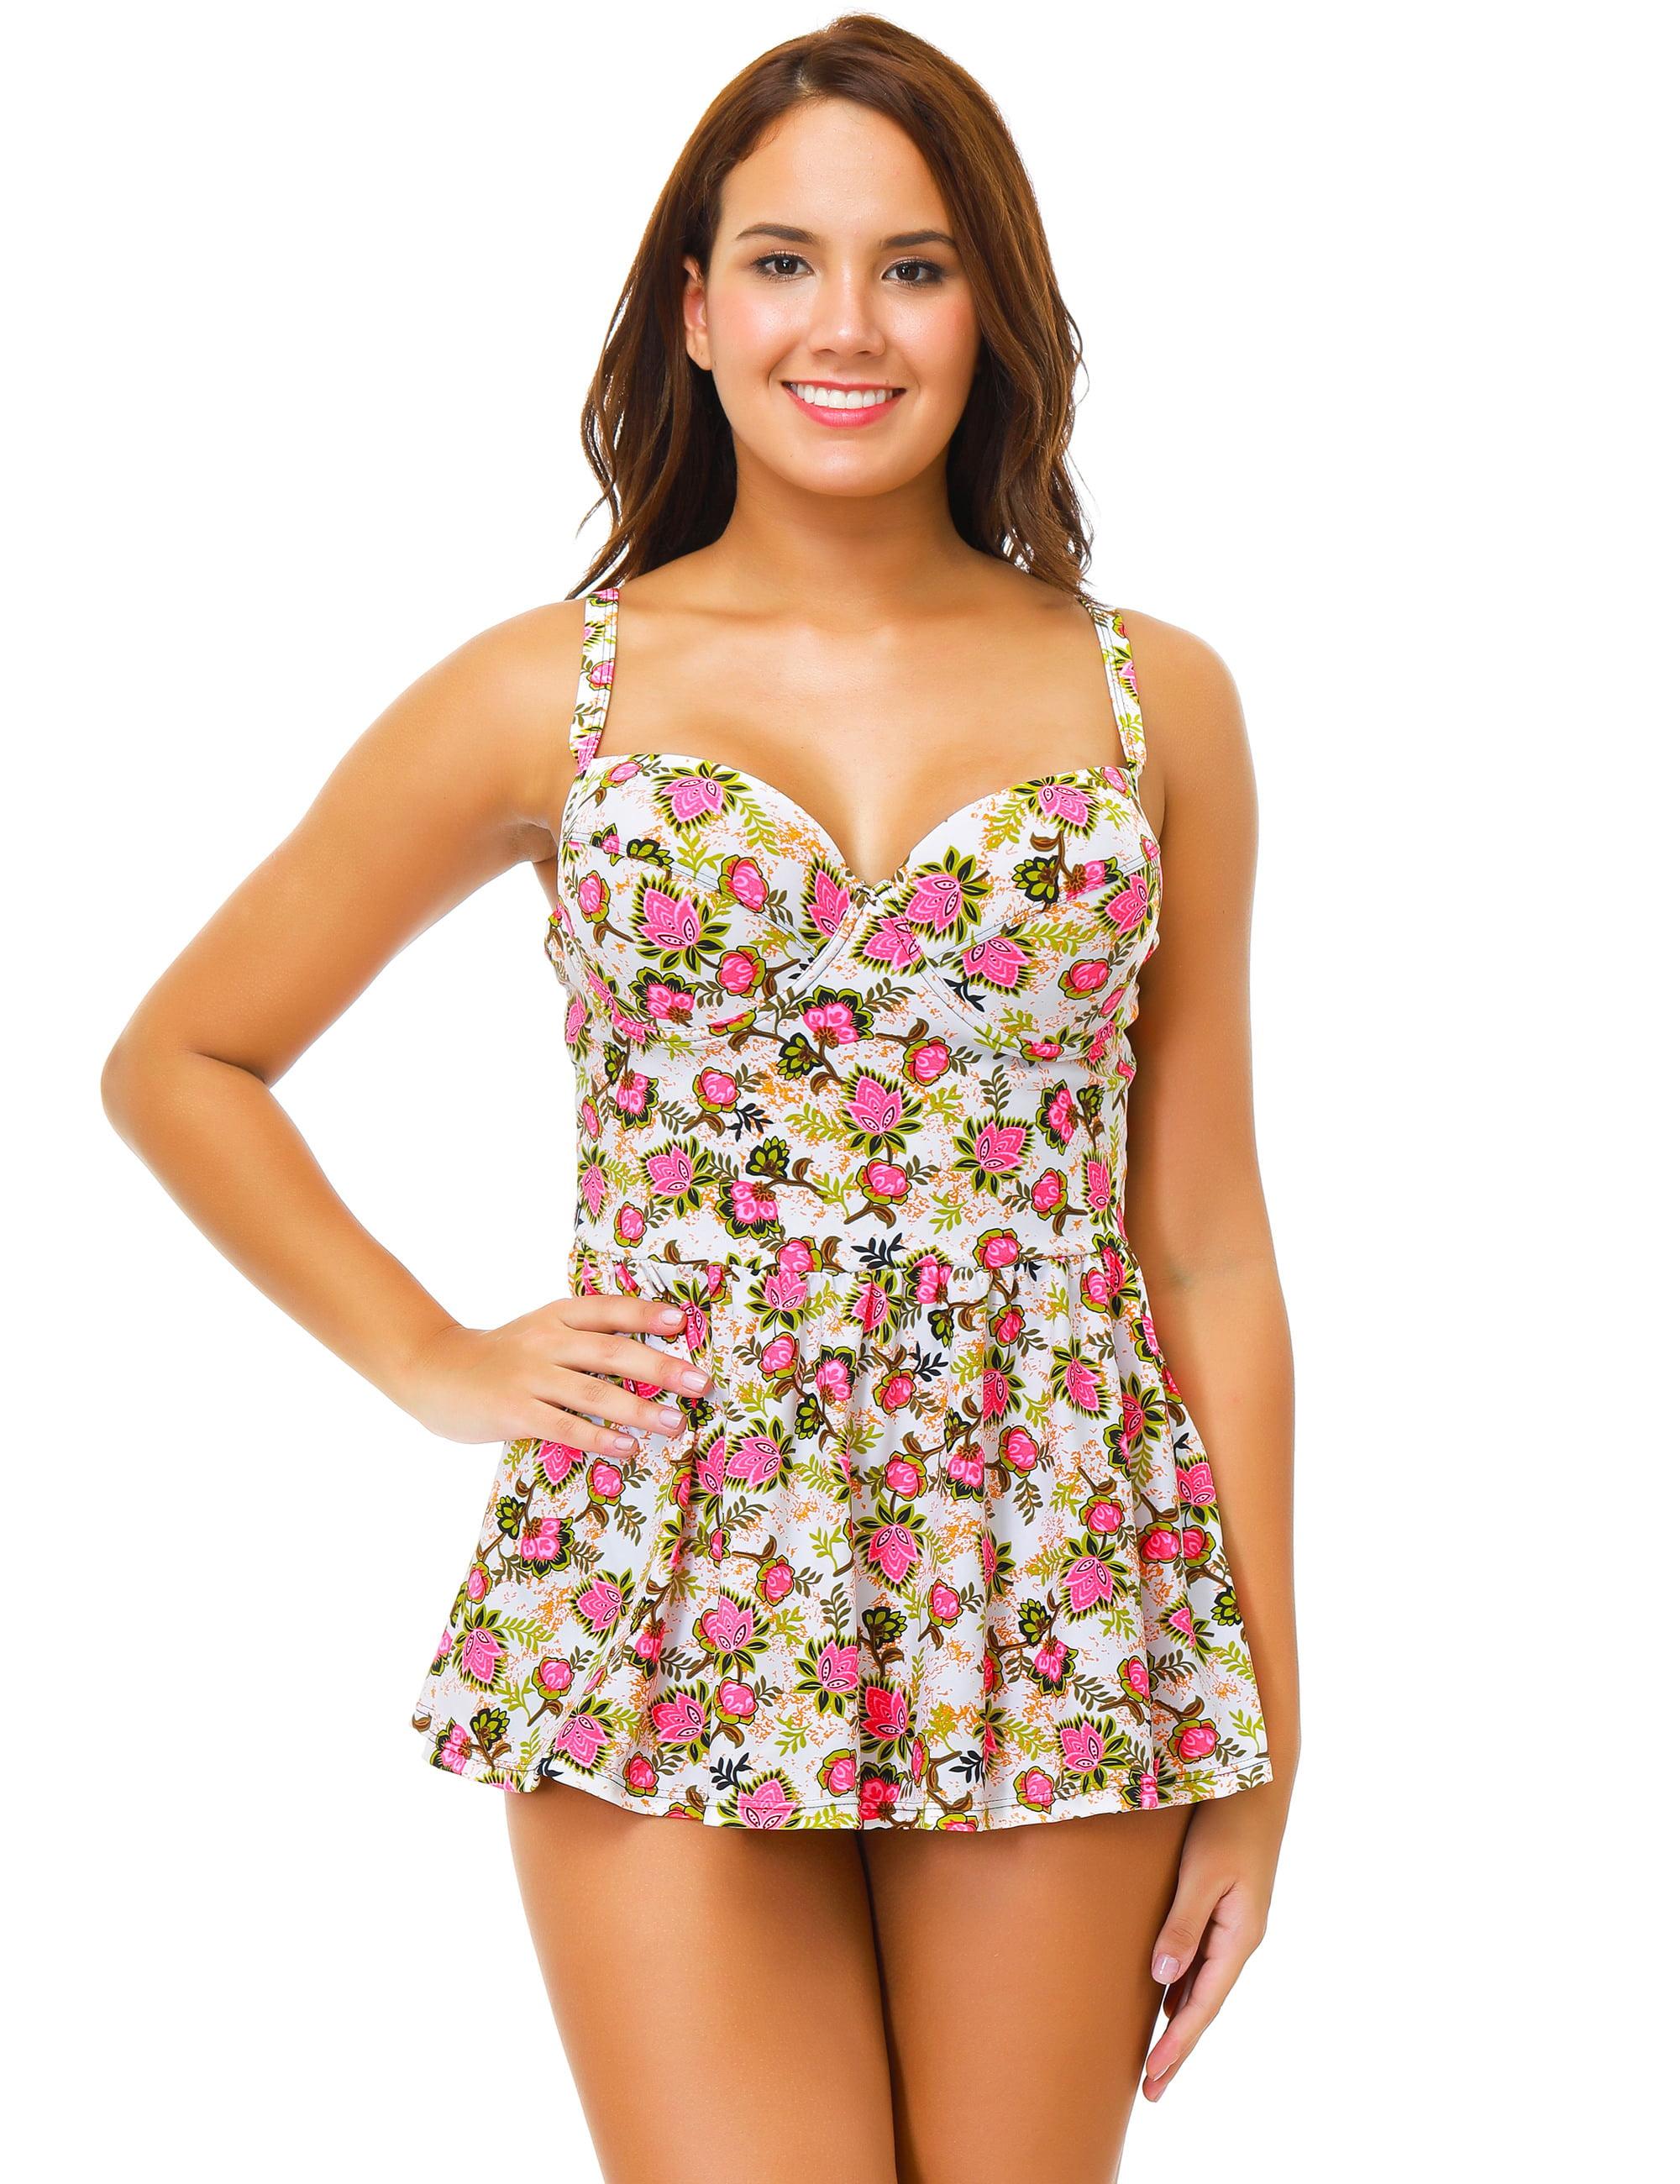 0d094a2f42 SENFLOCO - Senfloco Women Plus Size Swimwear 2Pcs Tankini Set Swimsuit  Vintage Floral Cute Bathing Suit Bra Top Beach Wear for Beach Pool Parties,  ...